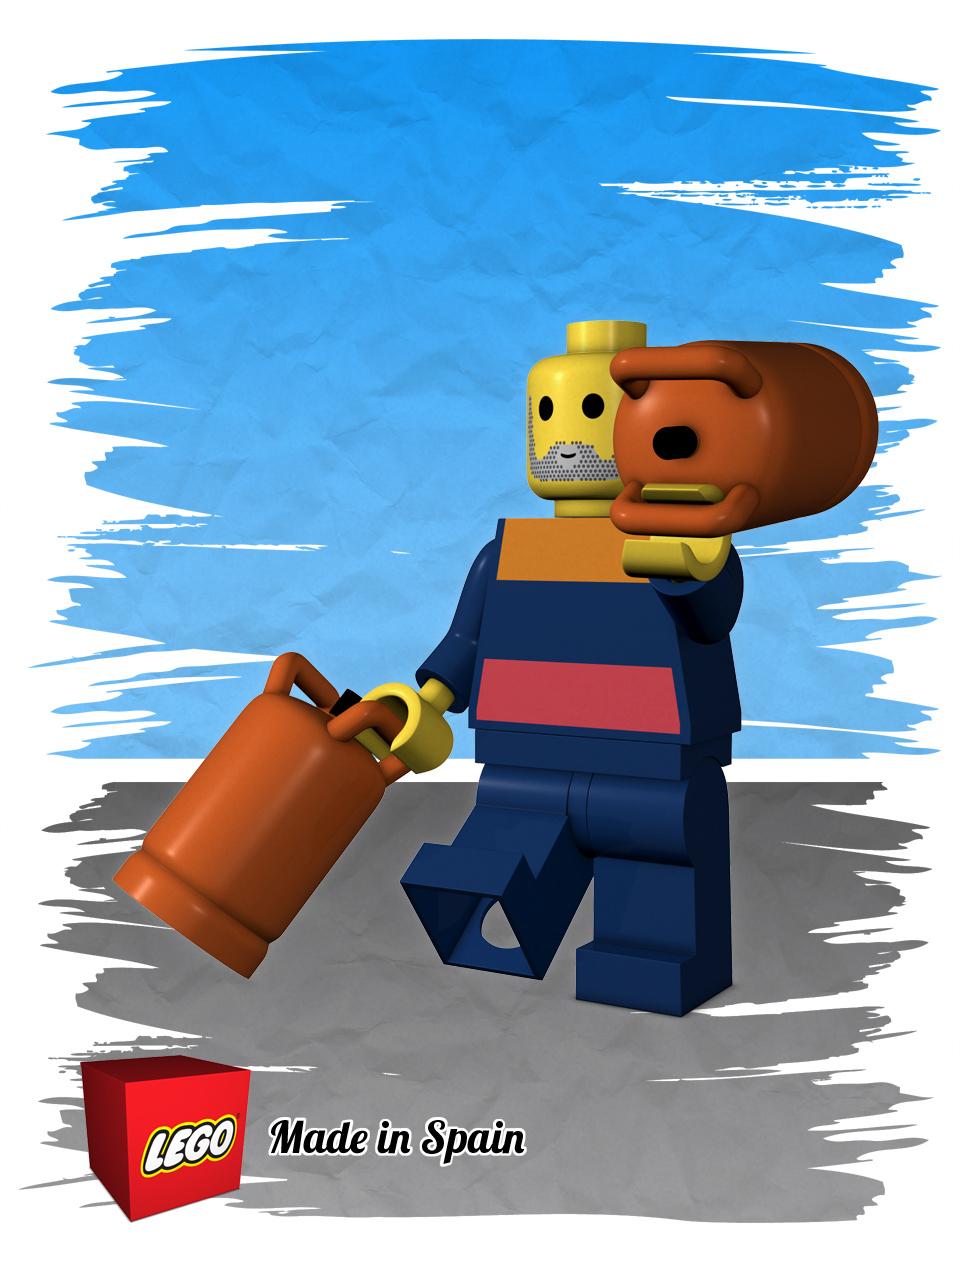 Andrewpyott lego made in spain b 1 44398f9b yvit